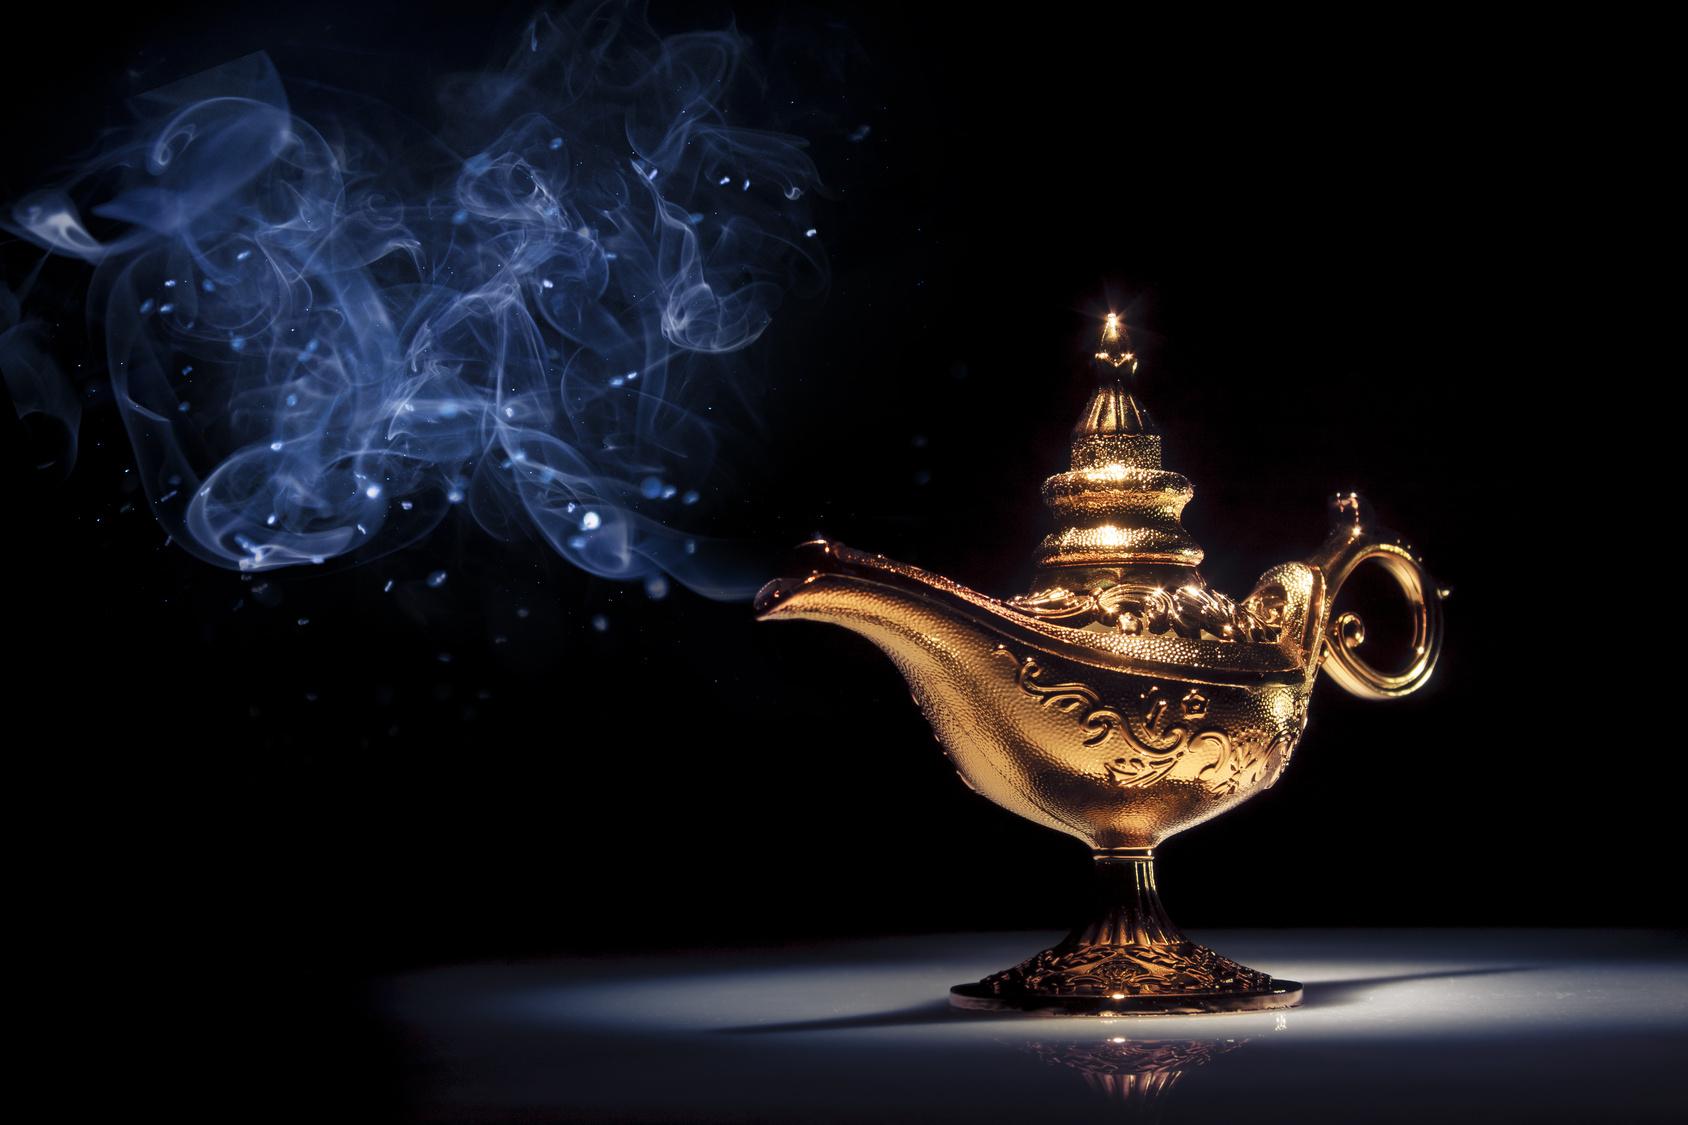 Real Genie Lamp